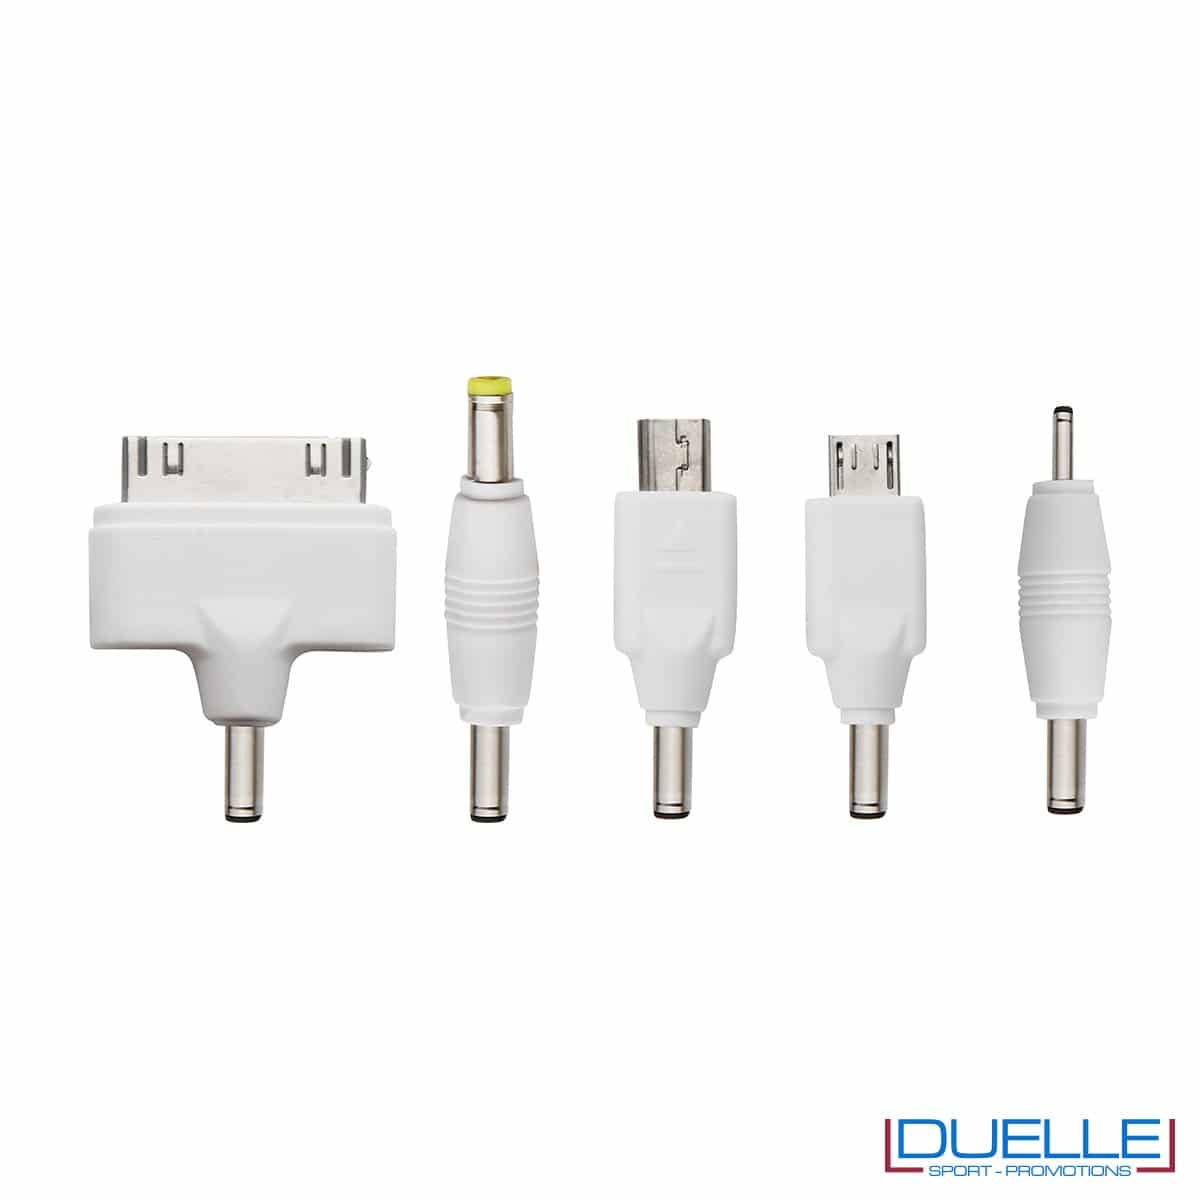 Connettori per caricabatteria USB LED